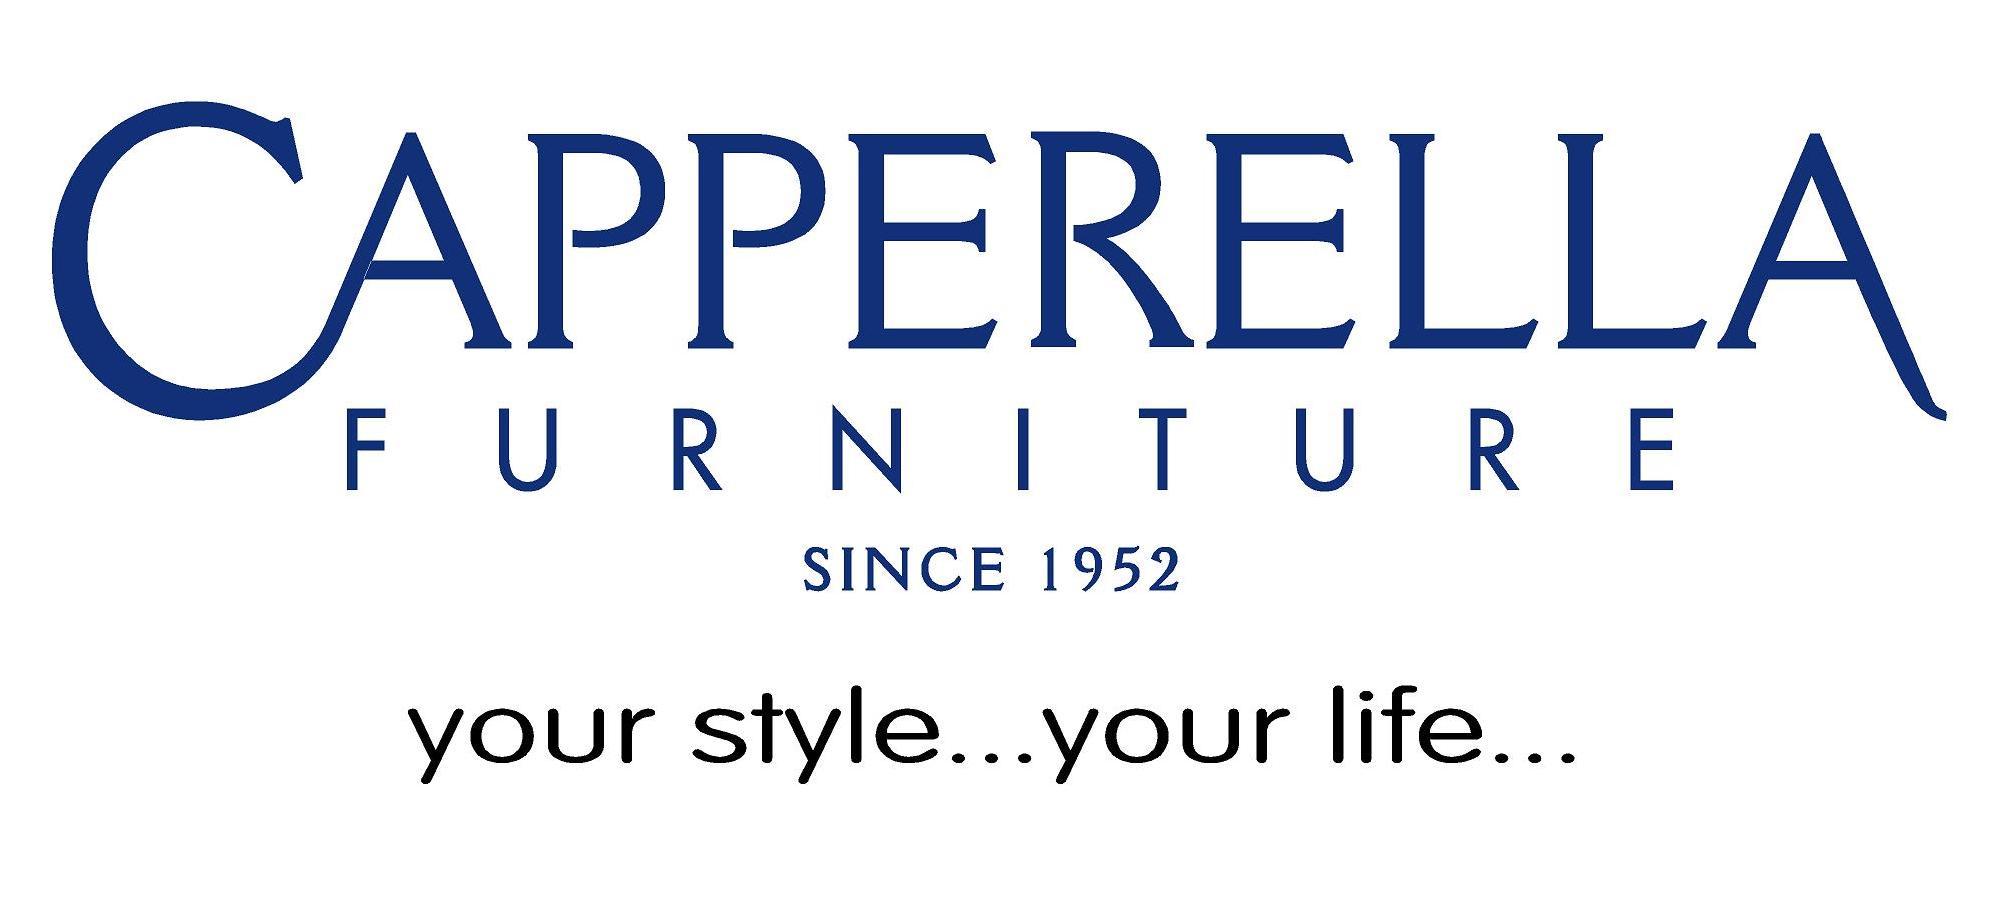 Capperella Furniture